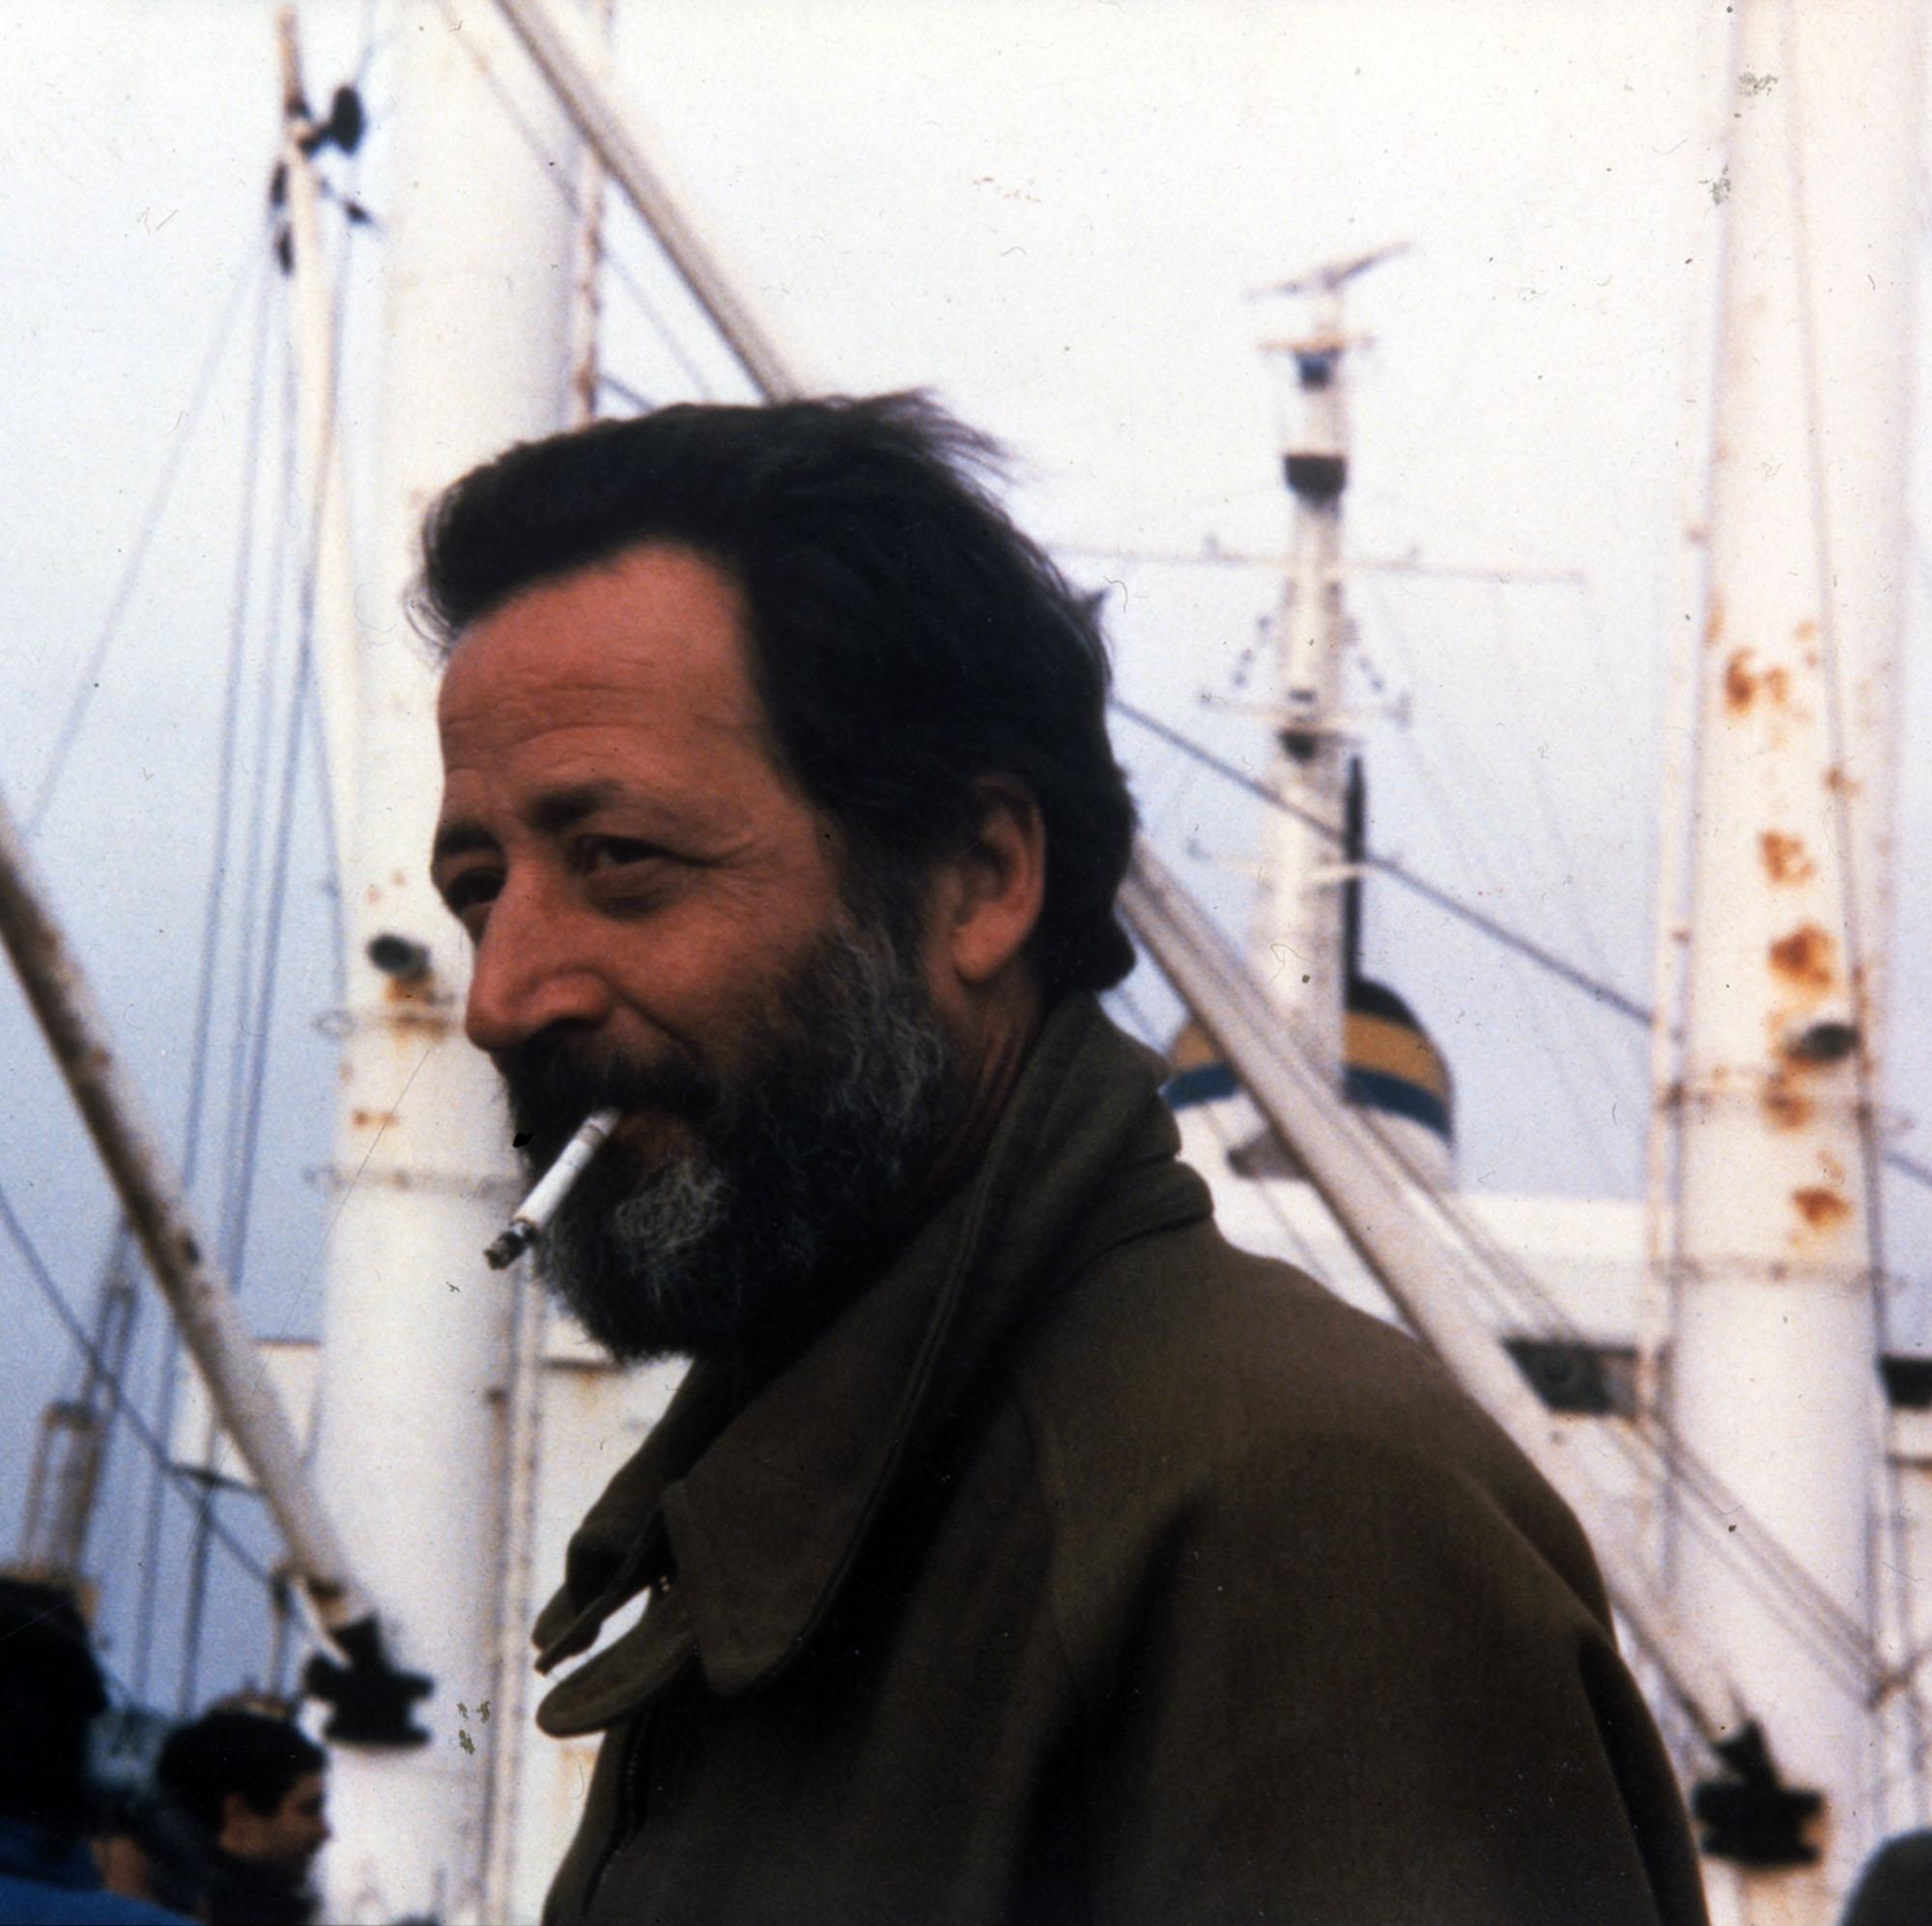 Marco Biassoni